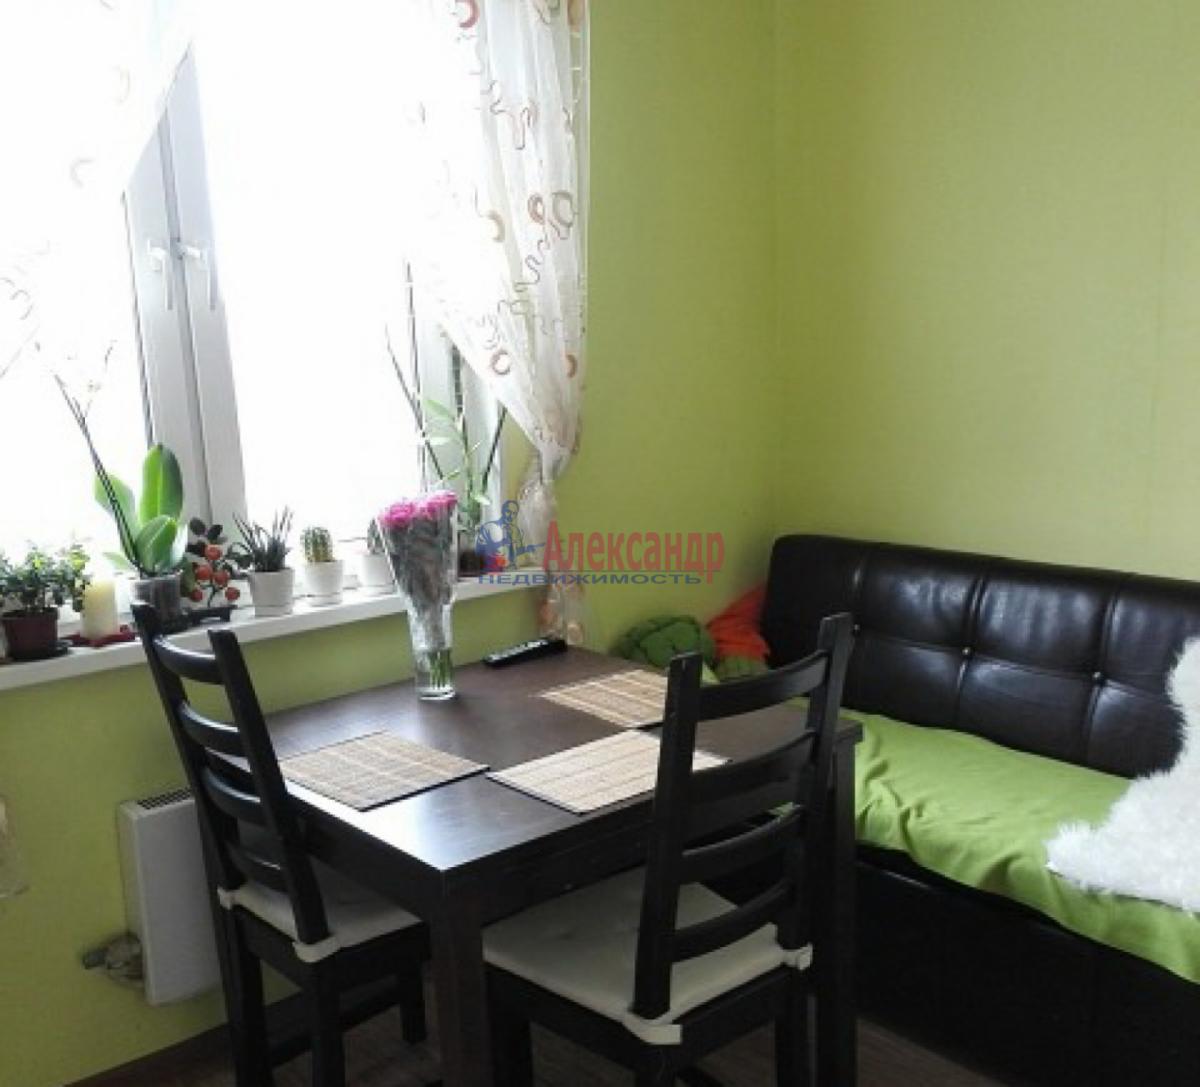 1-комнатная квартира (42м2) в аренду по адресу Ветеранов пр., 52— фото 2 из 5